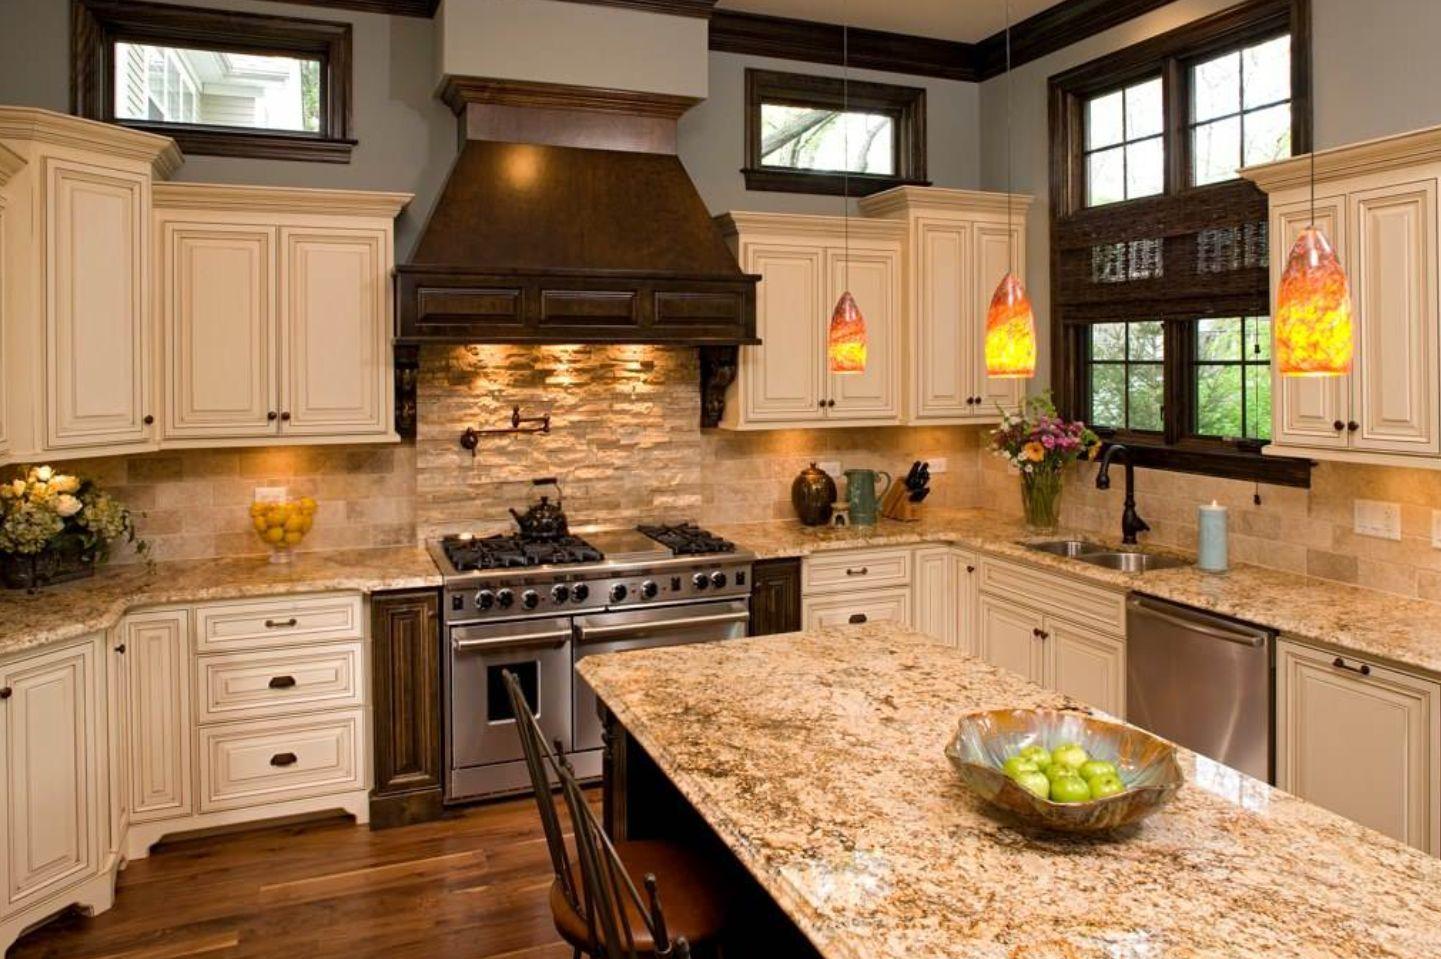 Travertine Backsplash Ideas For Nostalgic Kitchen Designs on Best Backsplash For Granite Countertops  id=31263